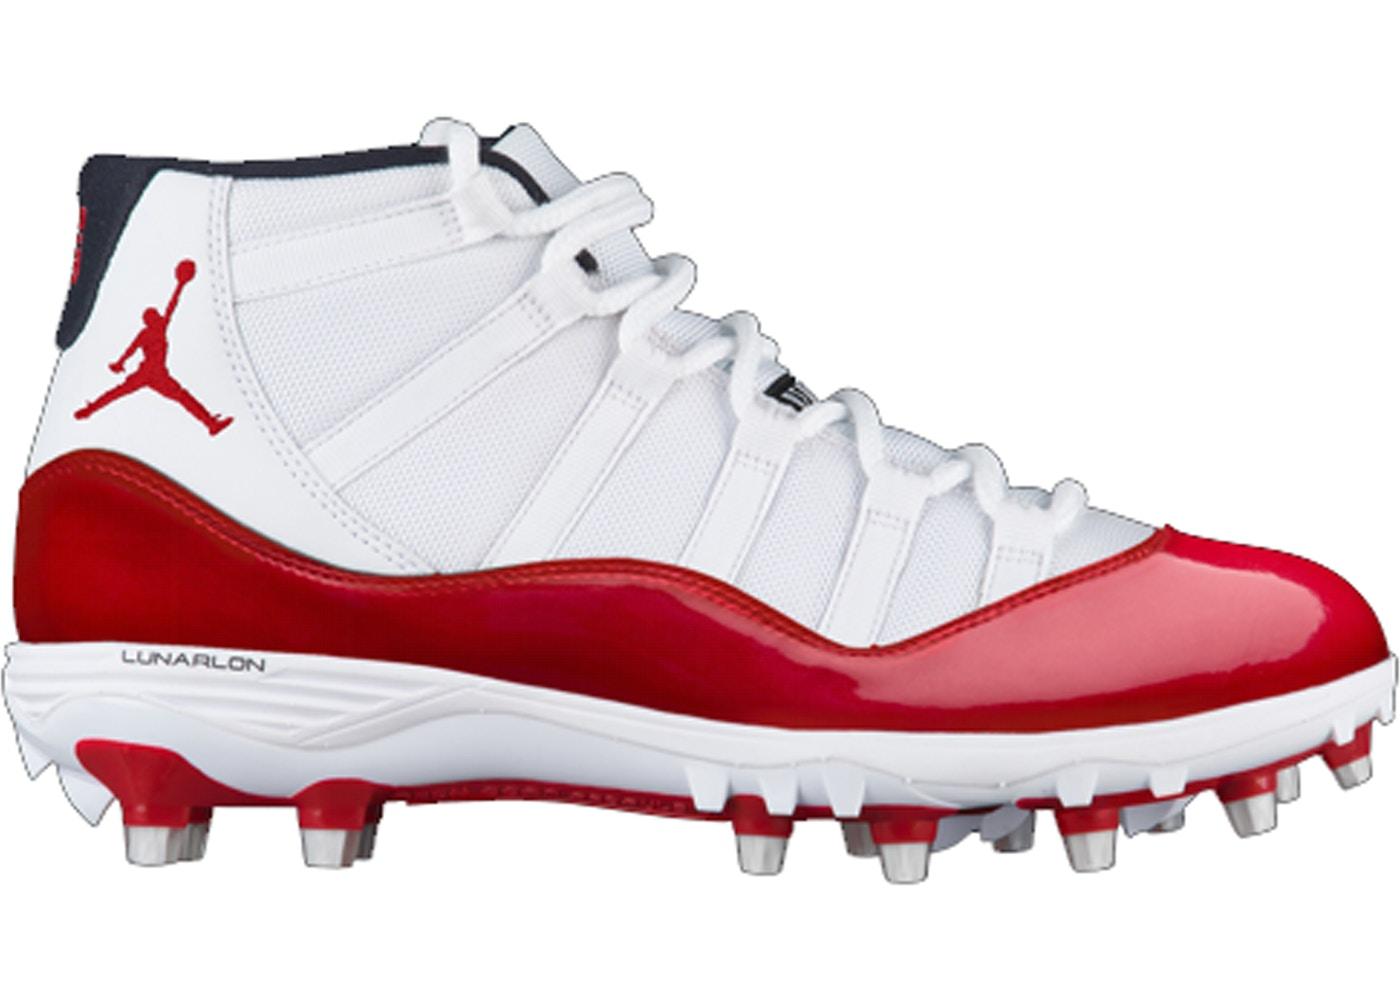 separation shoes 3278c e9108 Jordan 11 Retro Cleat White Red